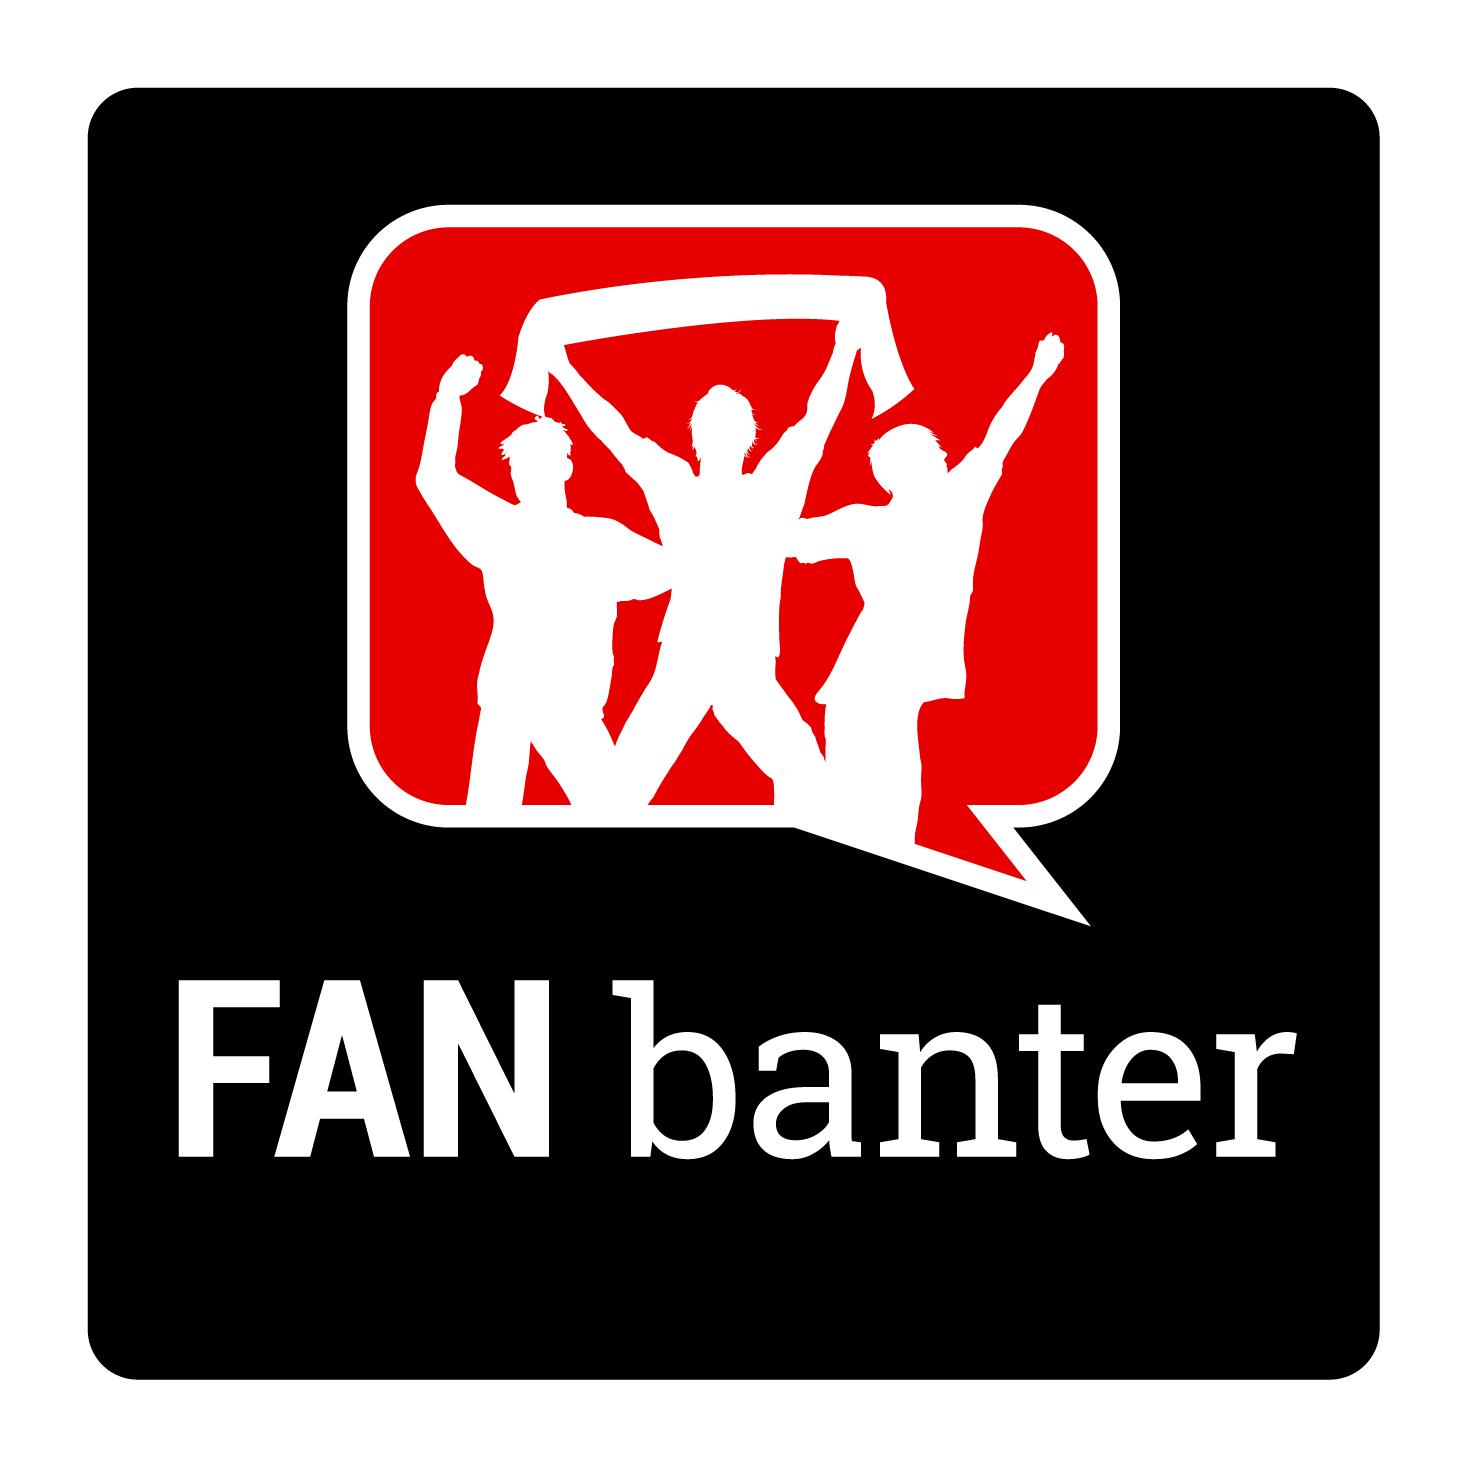 fanbanter.co.uk